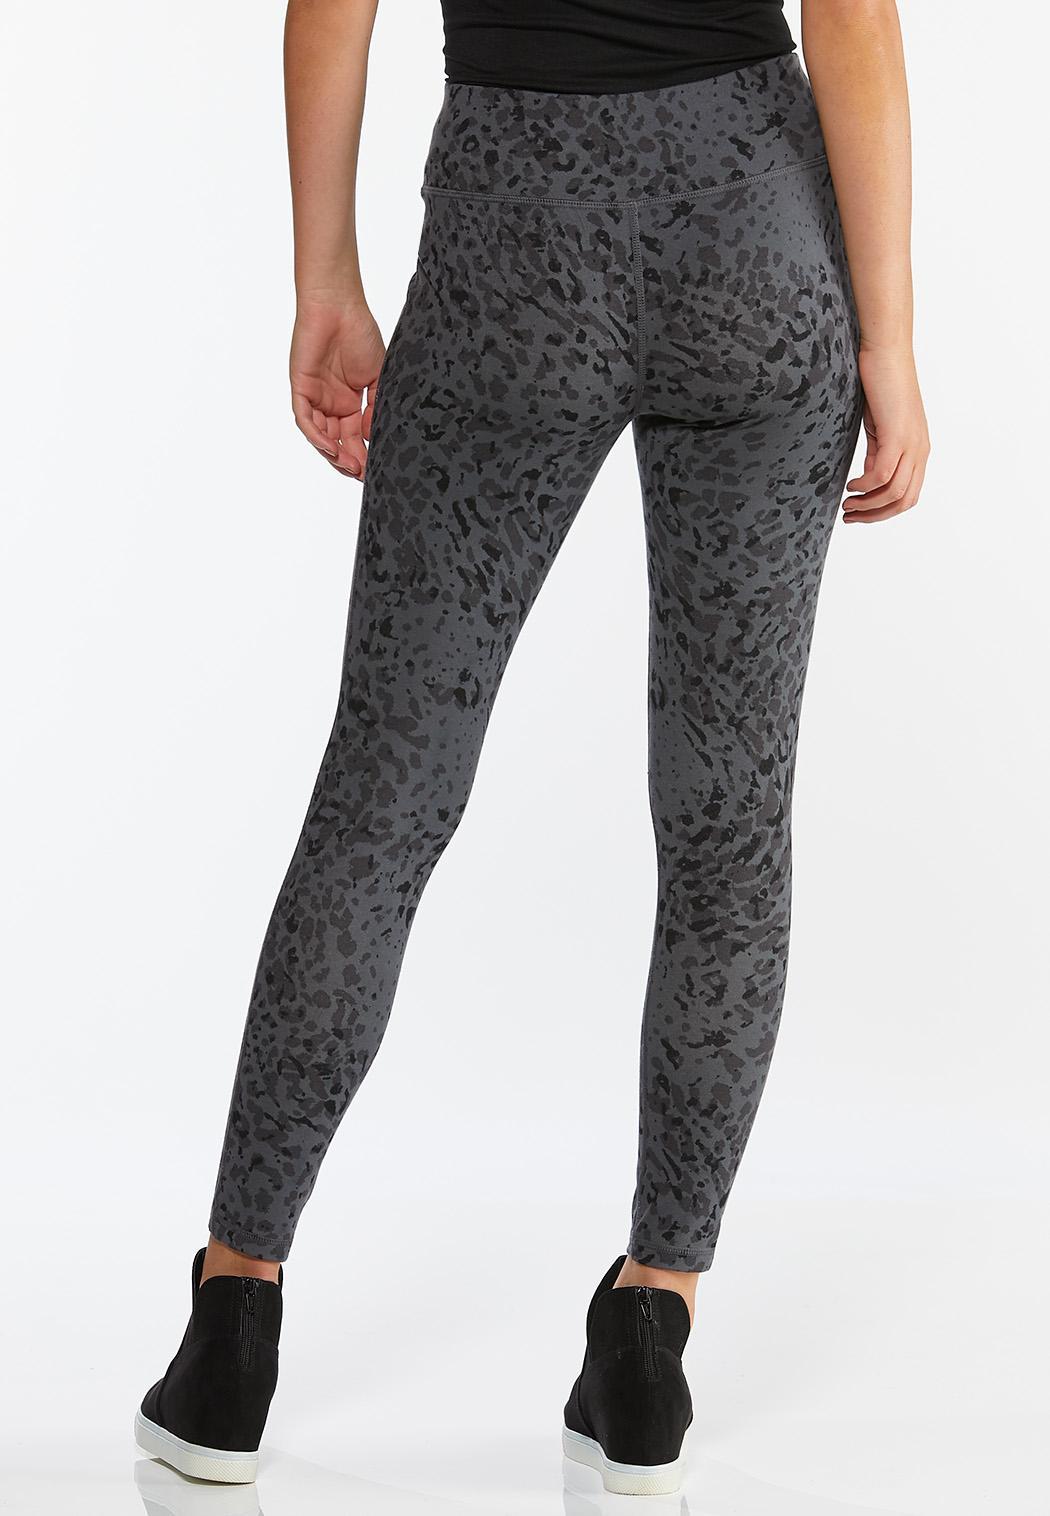 Gray Leopard Leggings (Item #44374250)